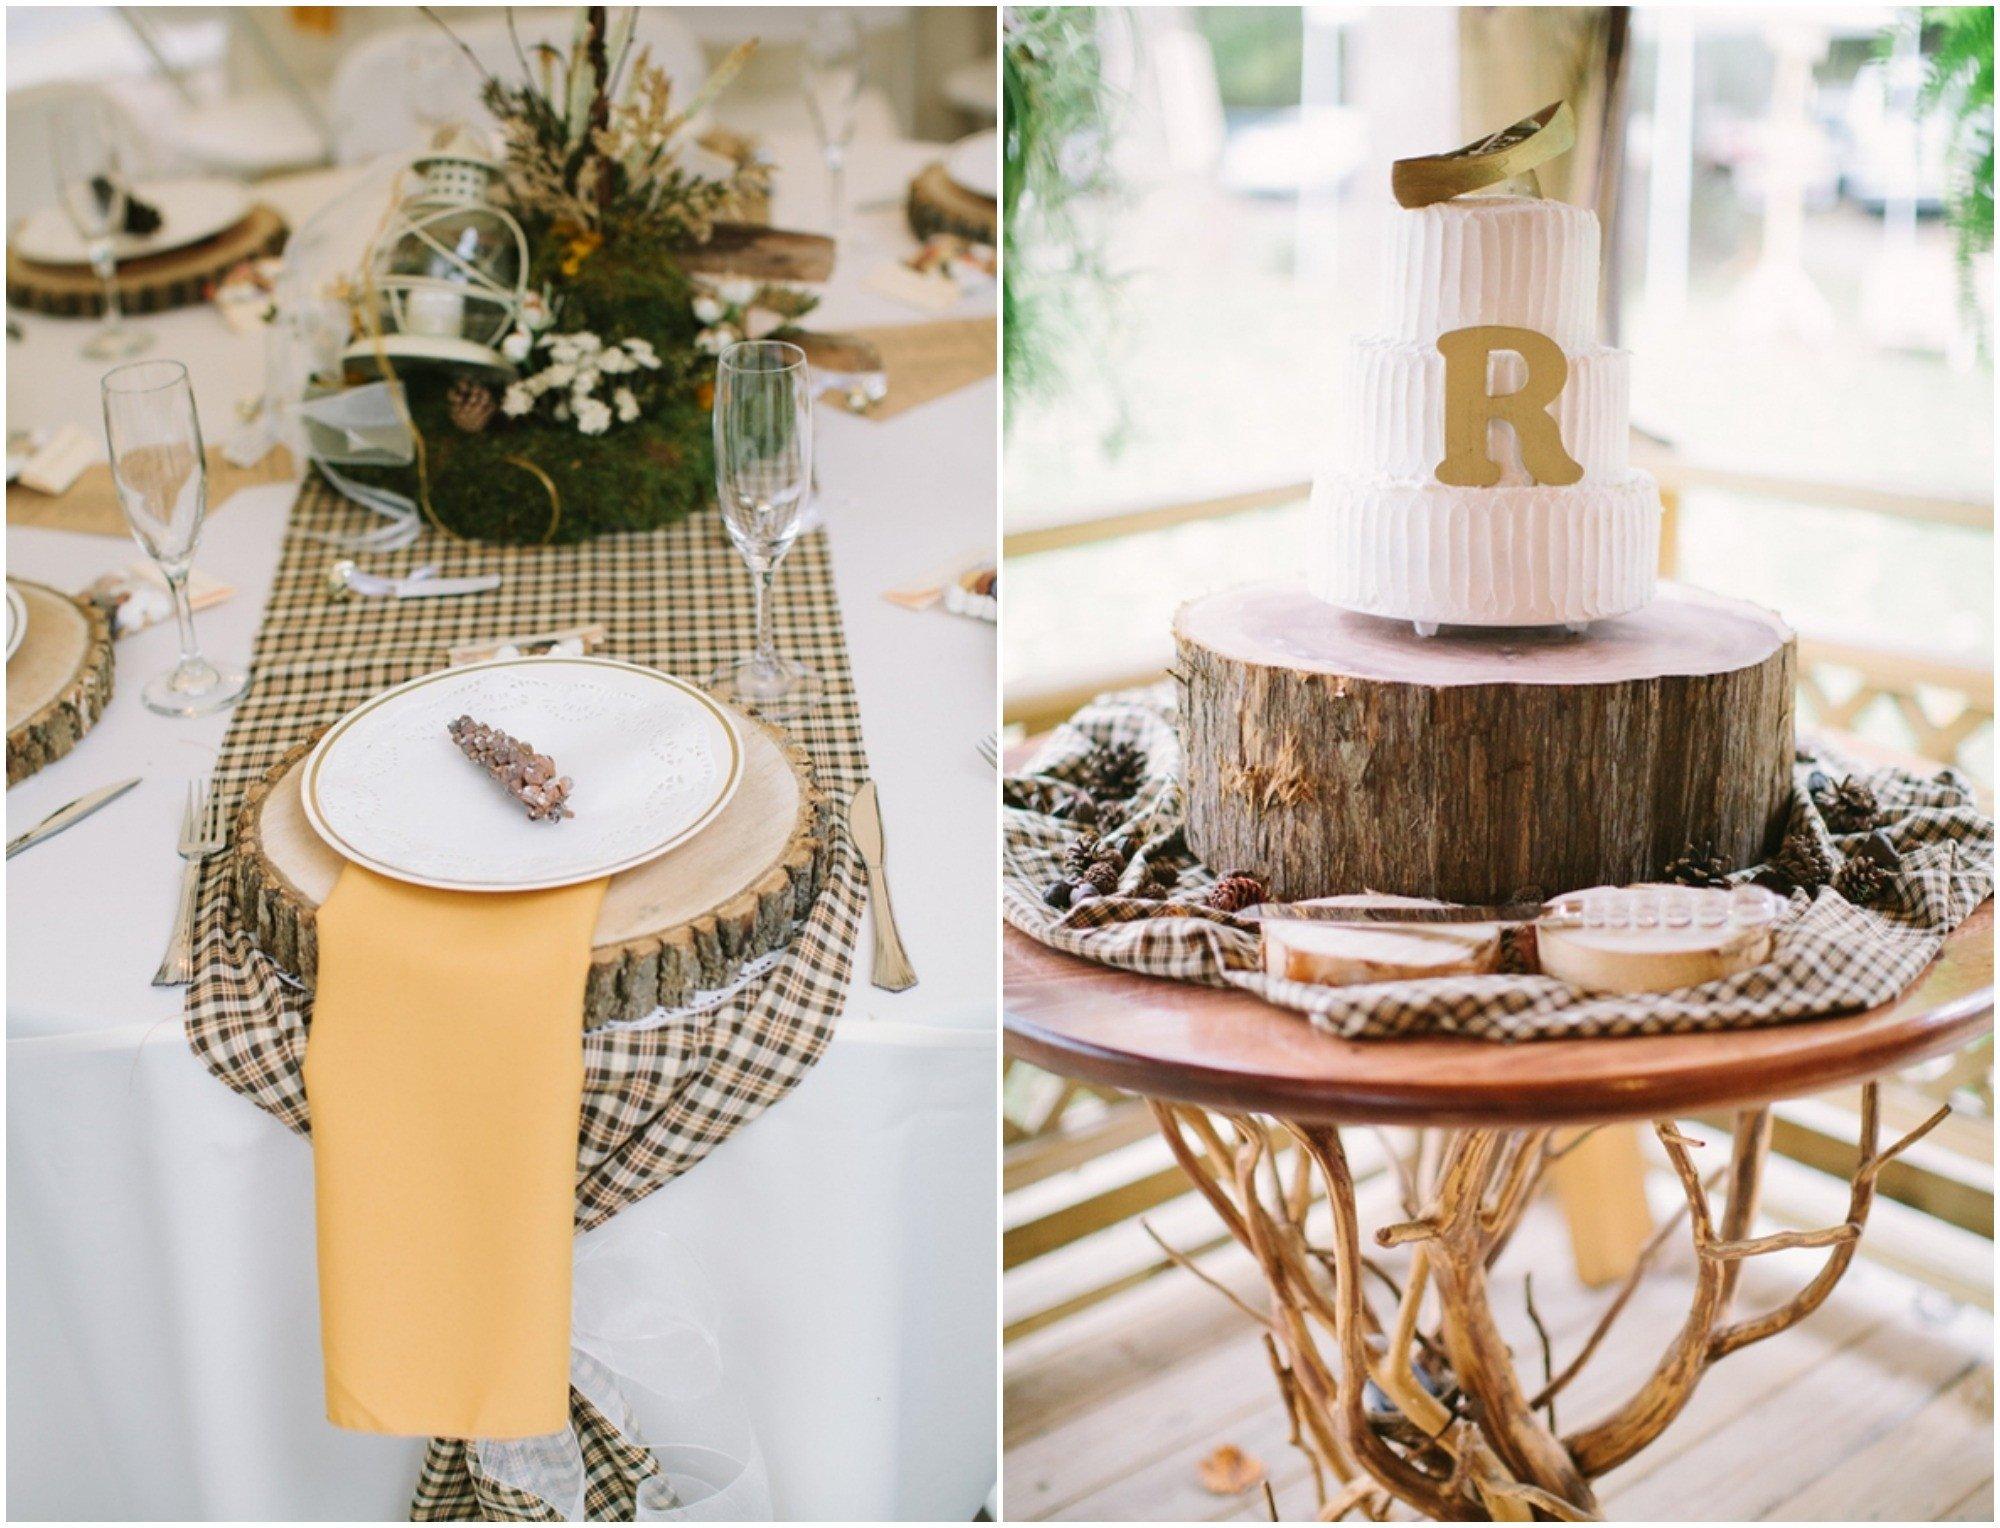 Rustic Table Decor for Weddings Elegant Elegant Virginia Woodland Rustic Wedding Rustic Wedding Chic